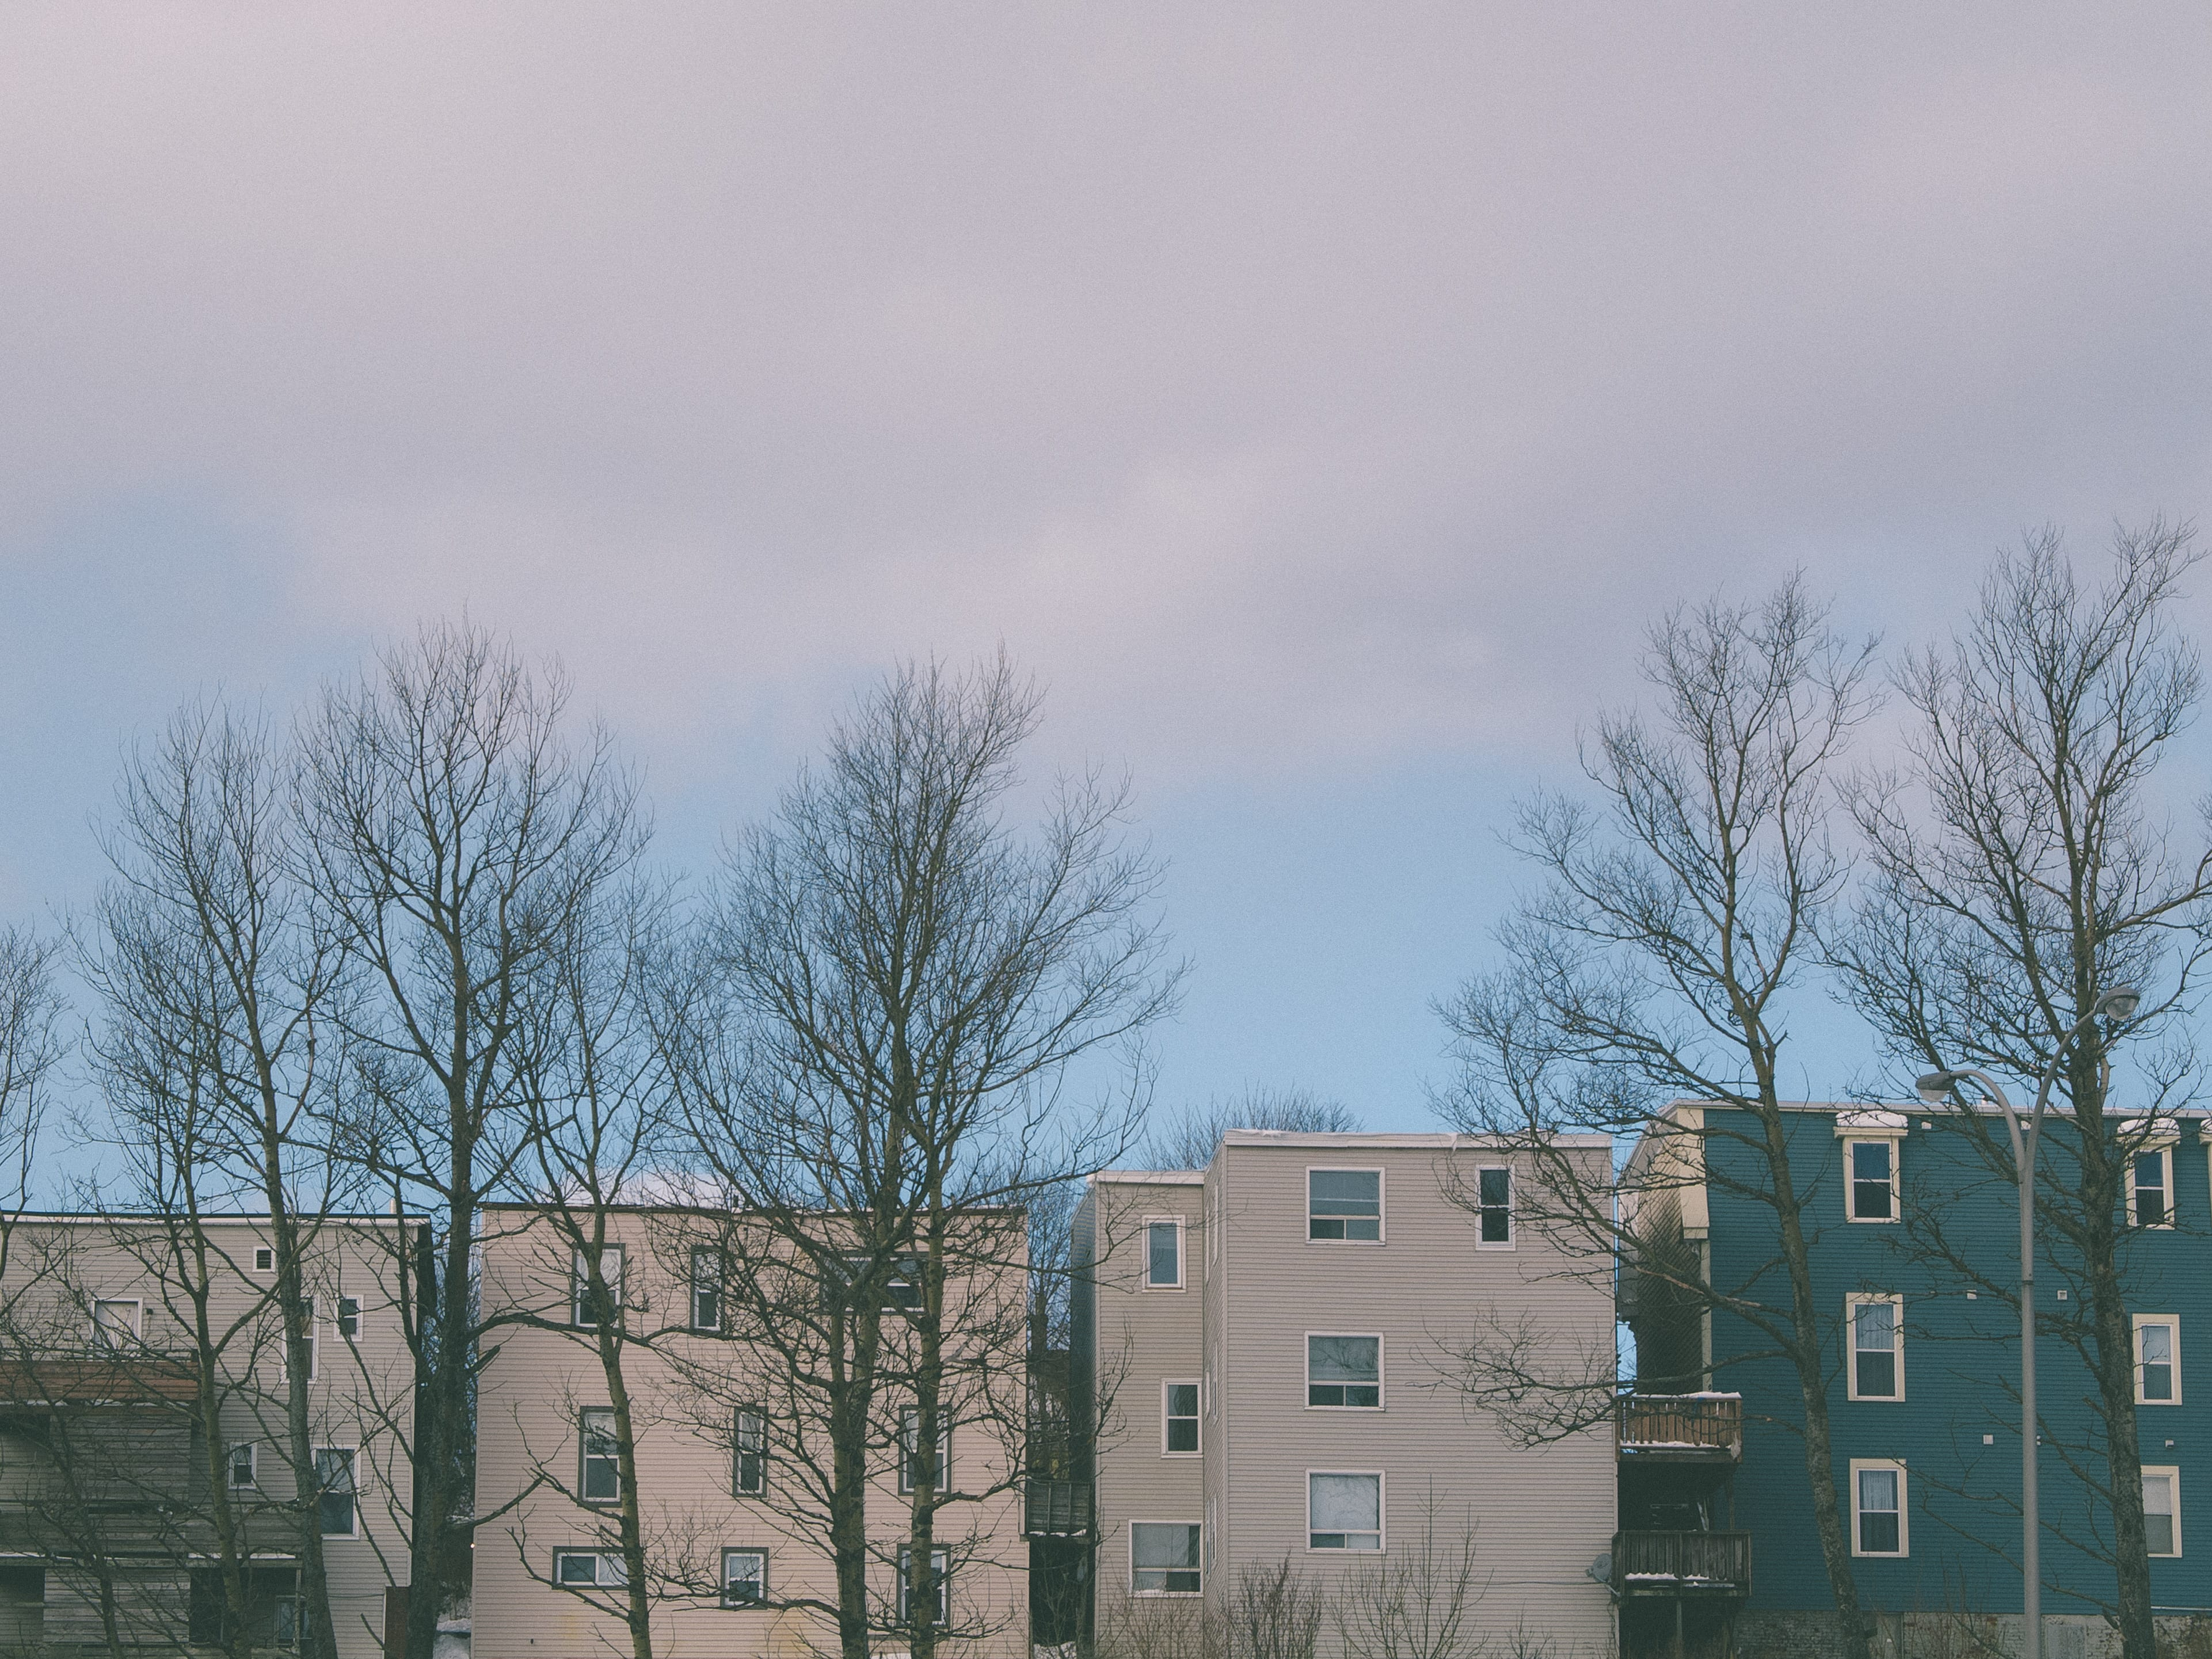 A photograph depicting Saint John Apartment Buildings